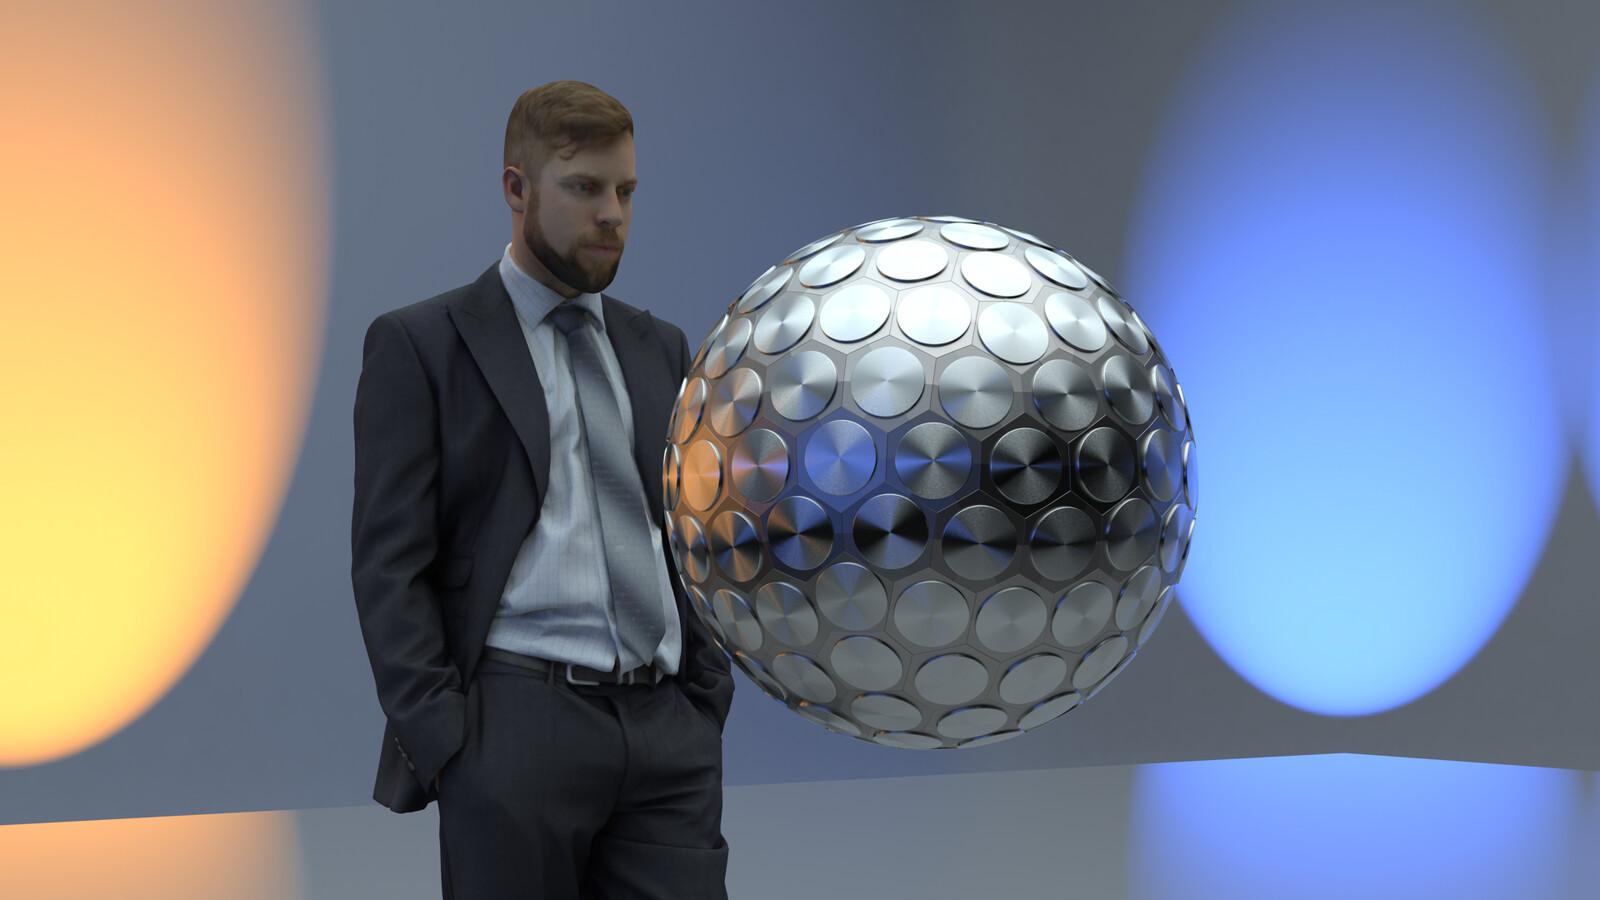 SU 2016 + Thea Render Bomb-Geodesic Sphere